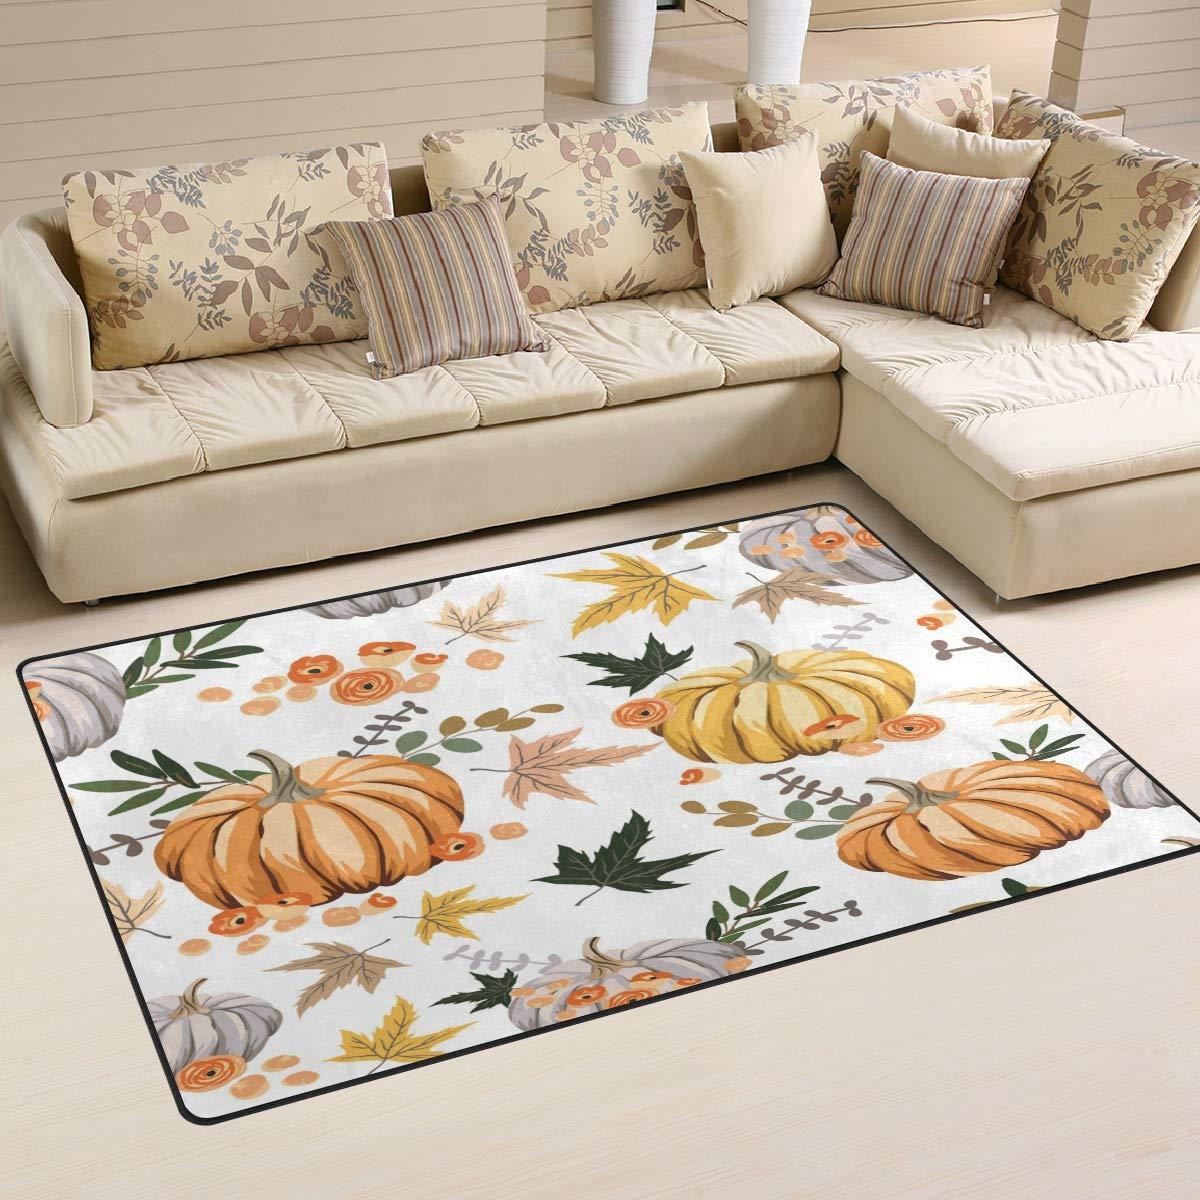 ALAZA Home Decor New mail Oklahoma City Mall order Autumn Orange Flowers Pumpkins Area Rug Leaves